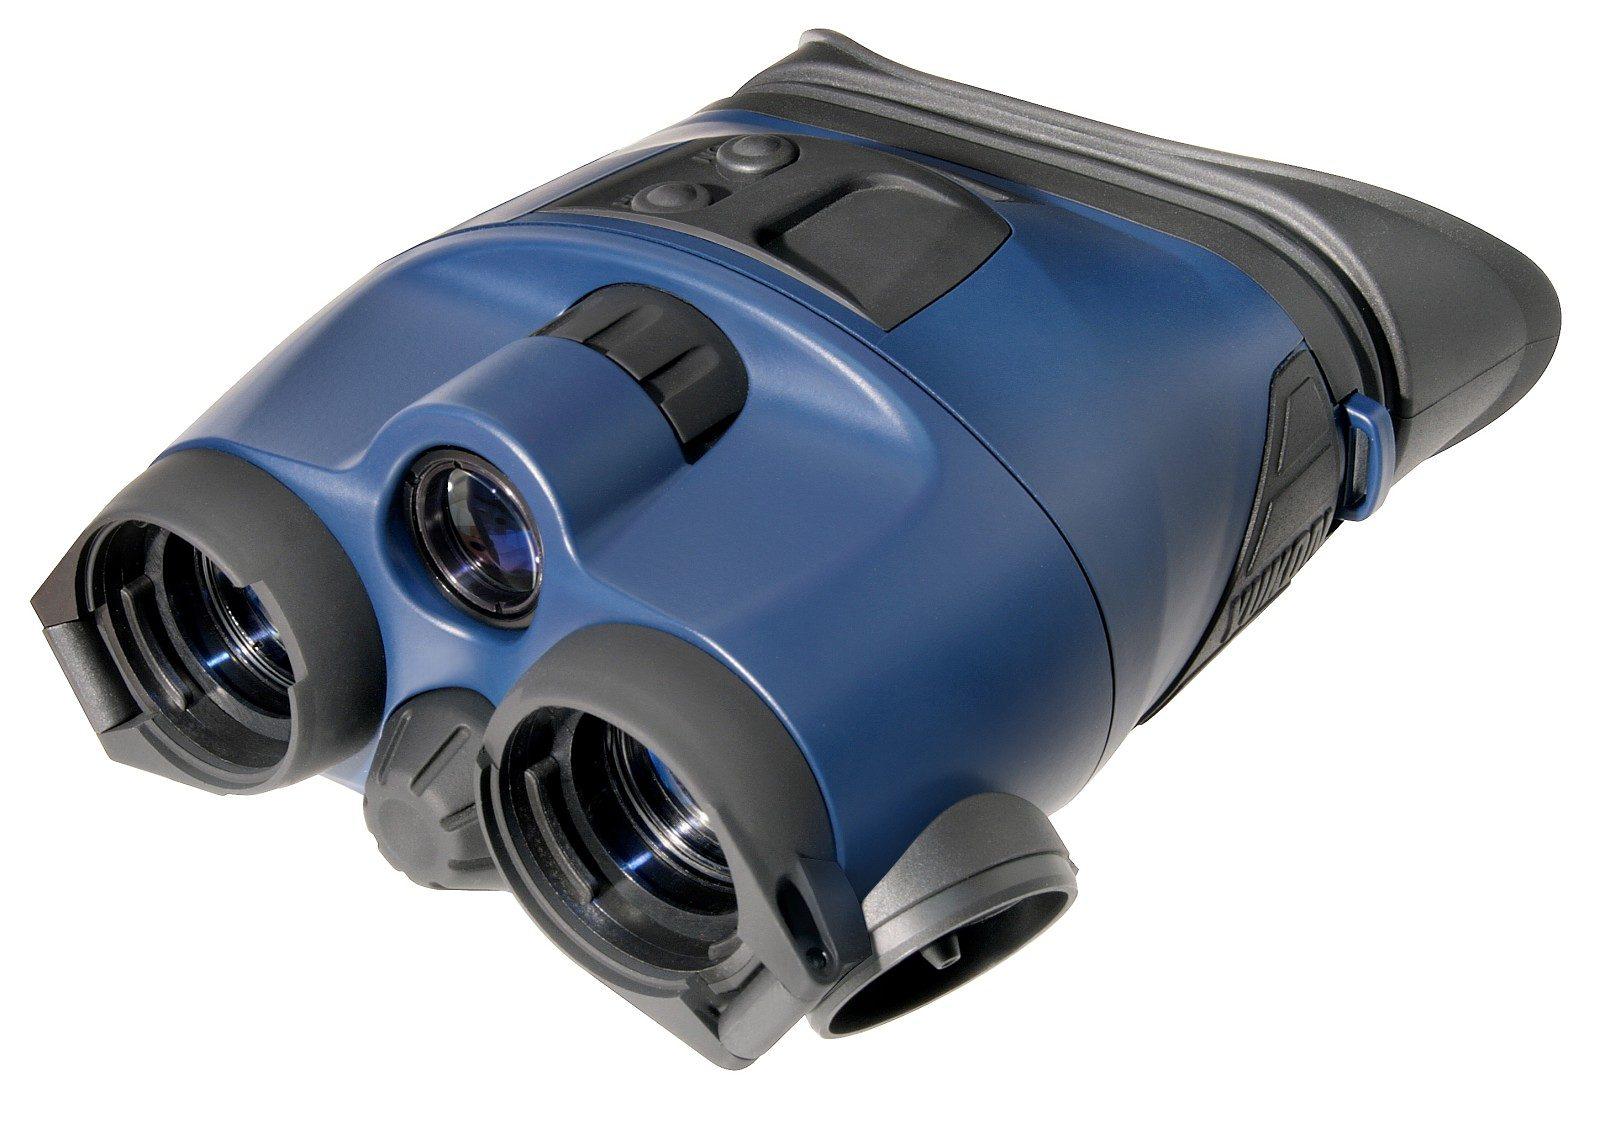 BRESSER Nachtsichtgerät »YUKON Tracker 2x24 WP Goggles Nachtsichtgerät«